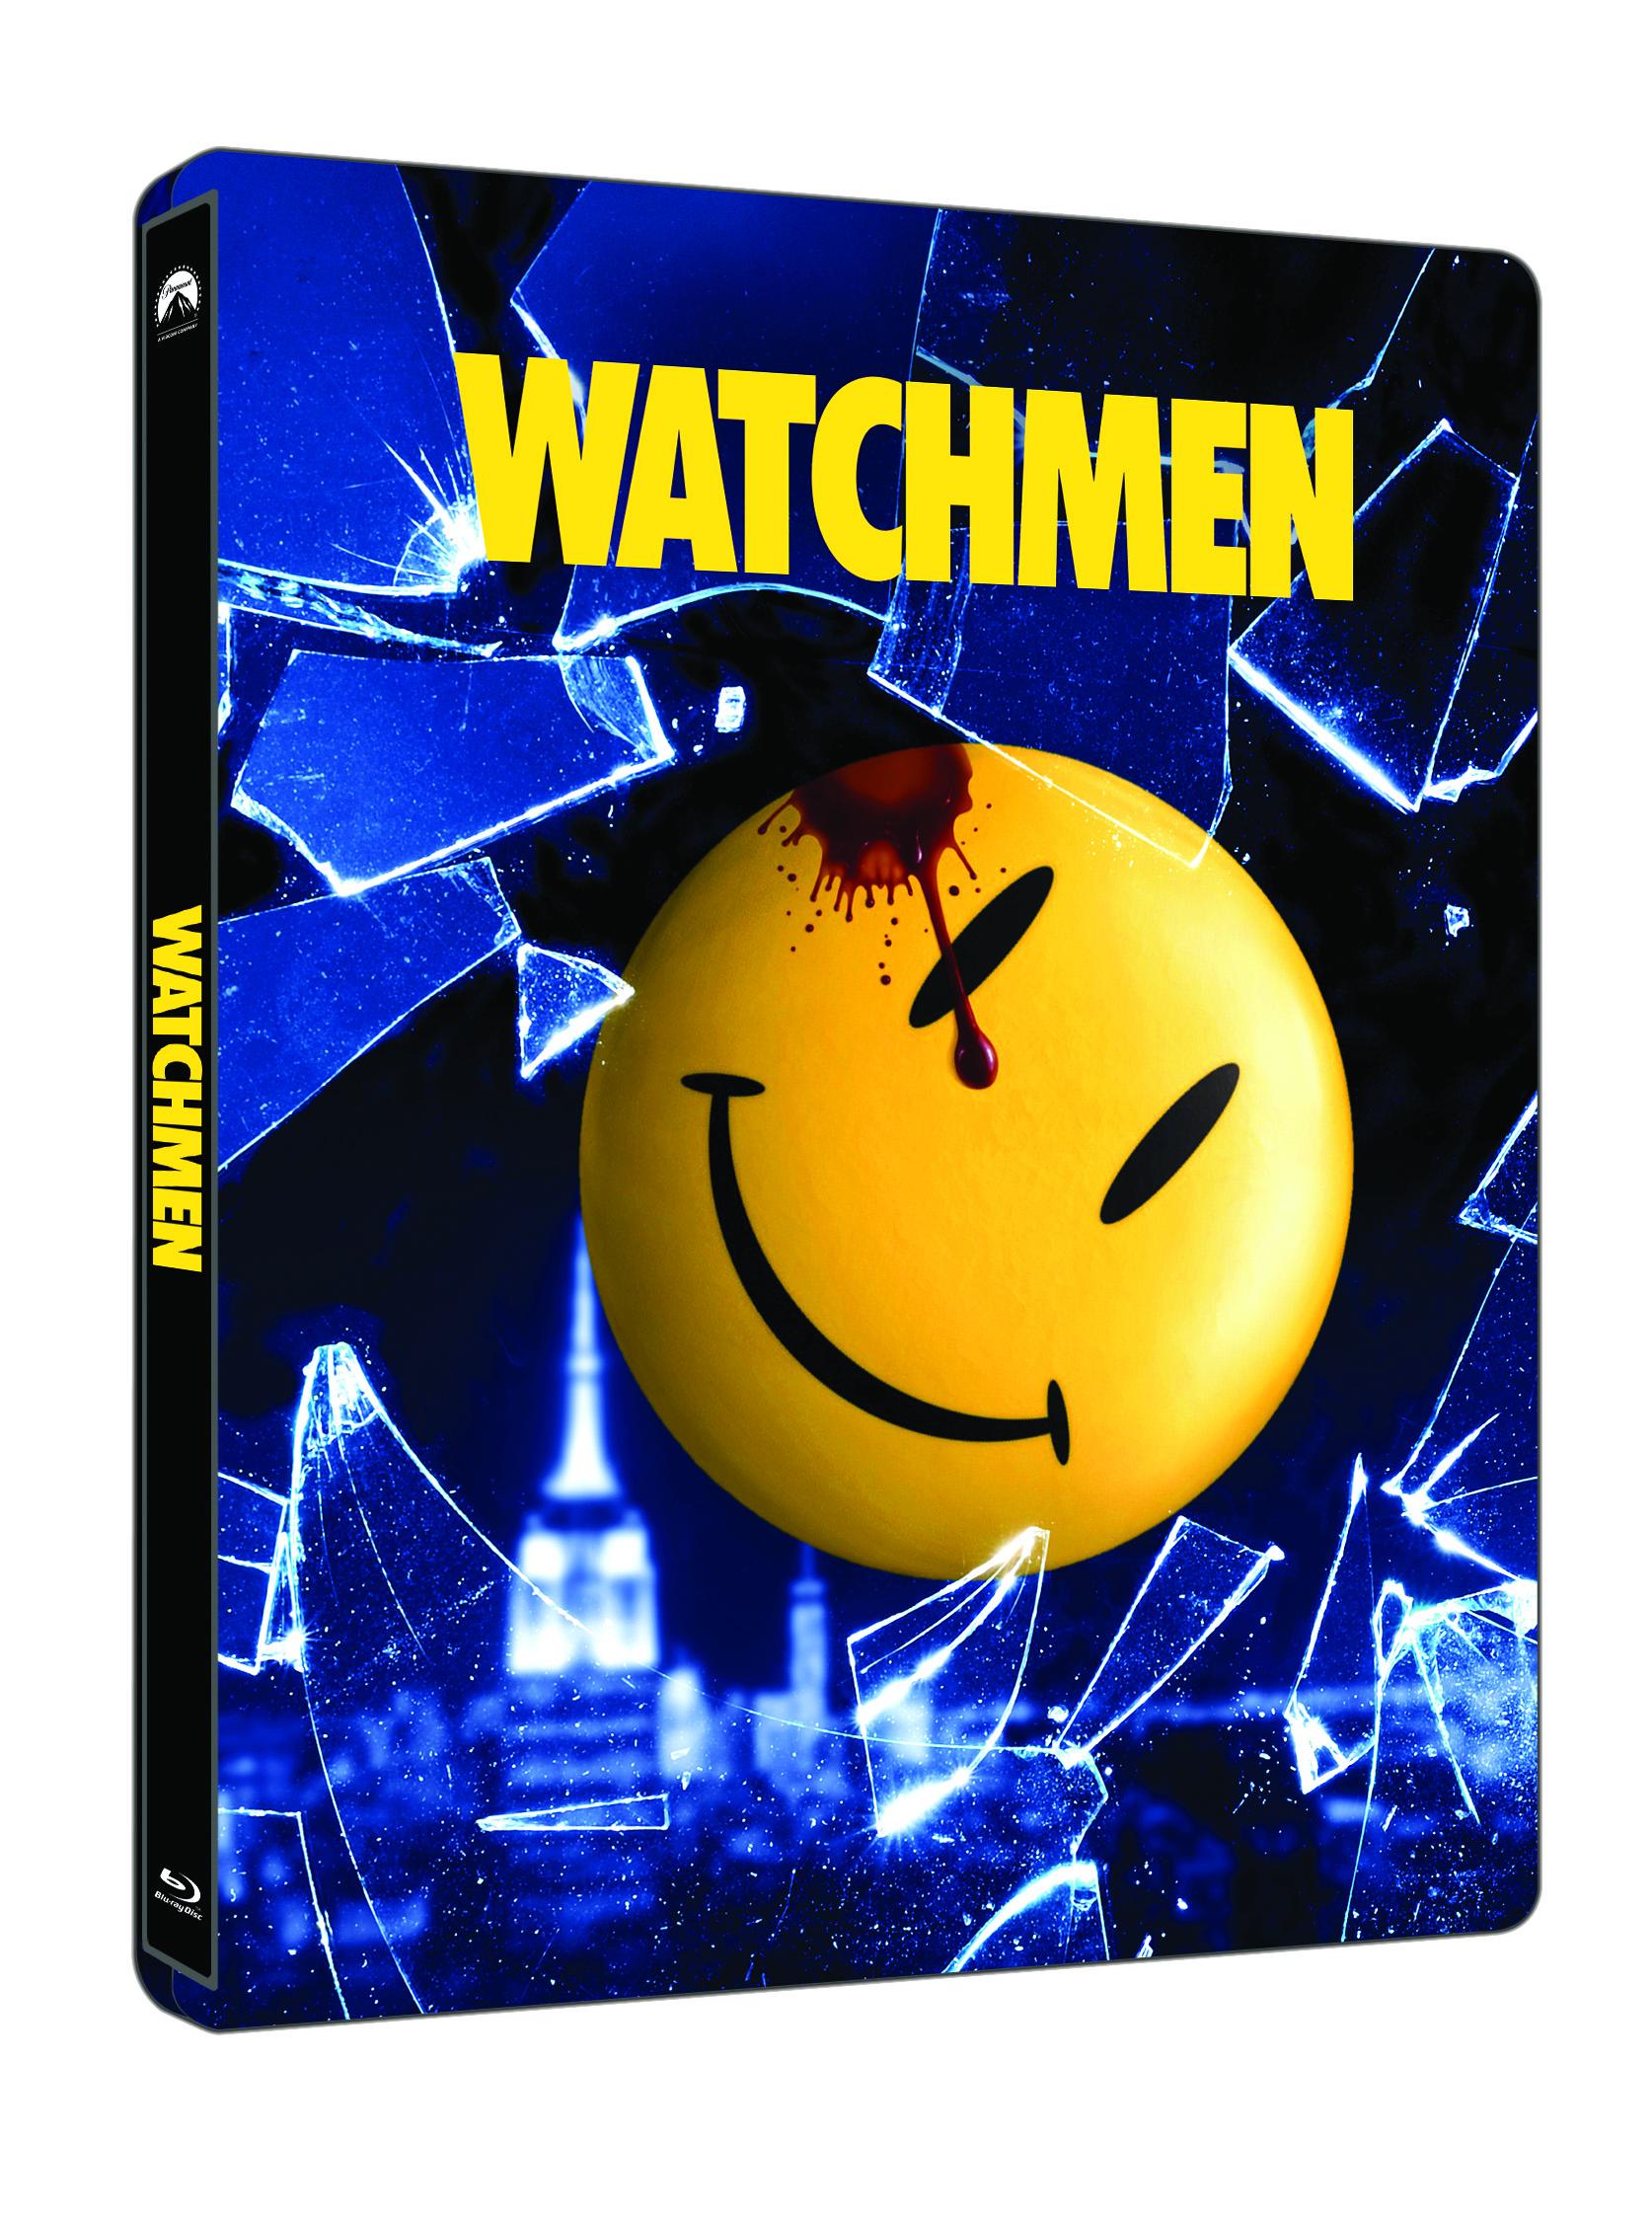 watchmen_hubd000944_steelbook_3d.jpg